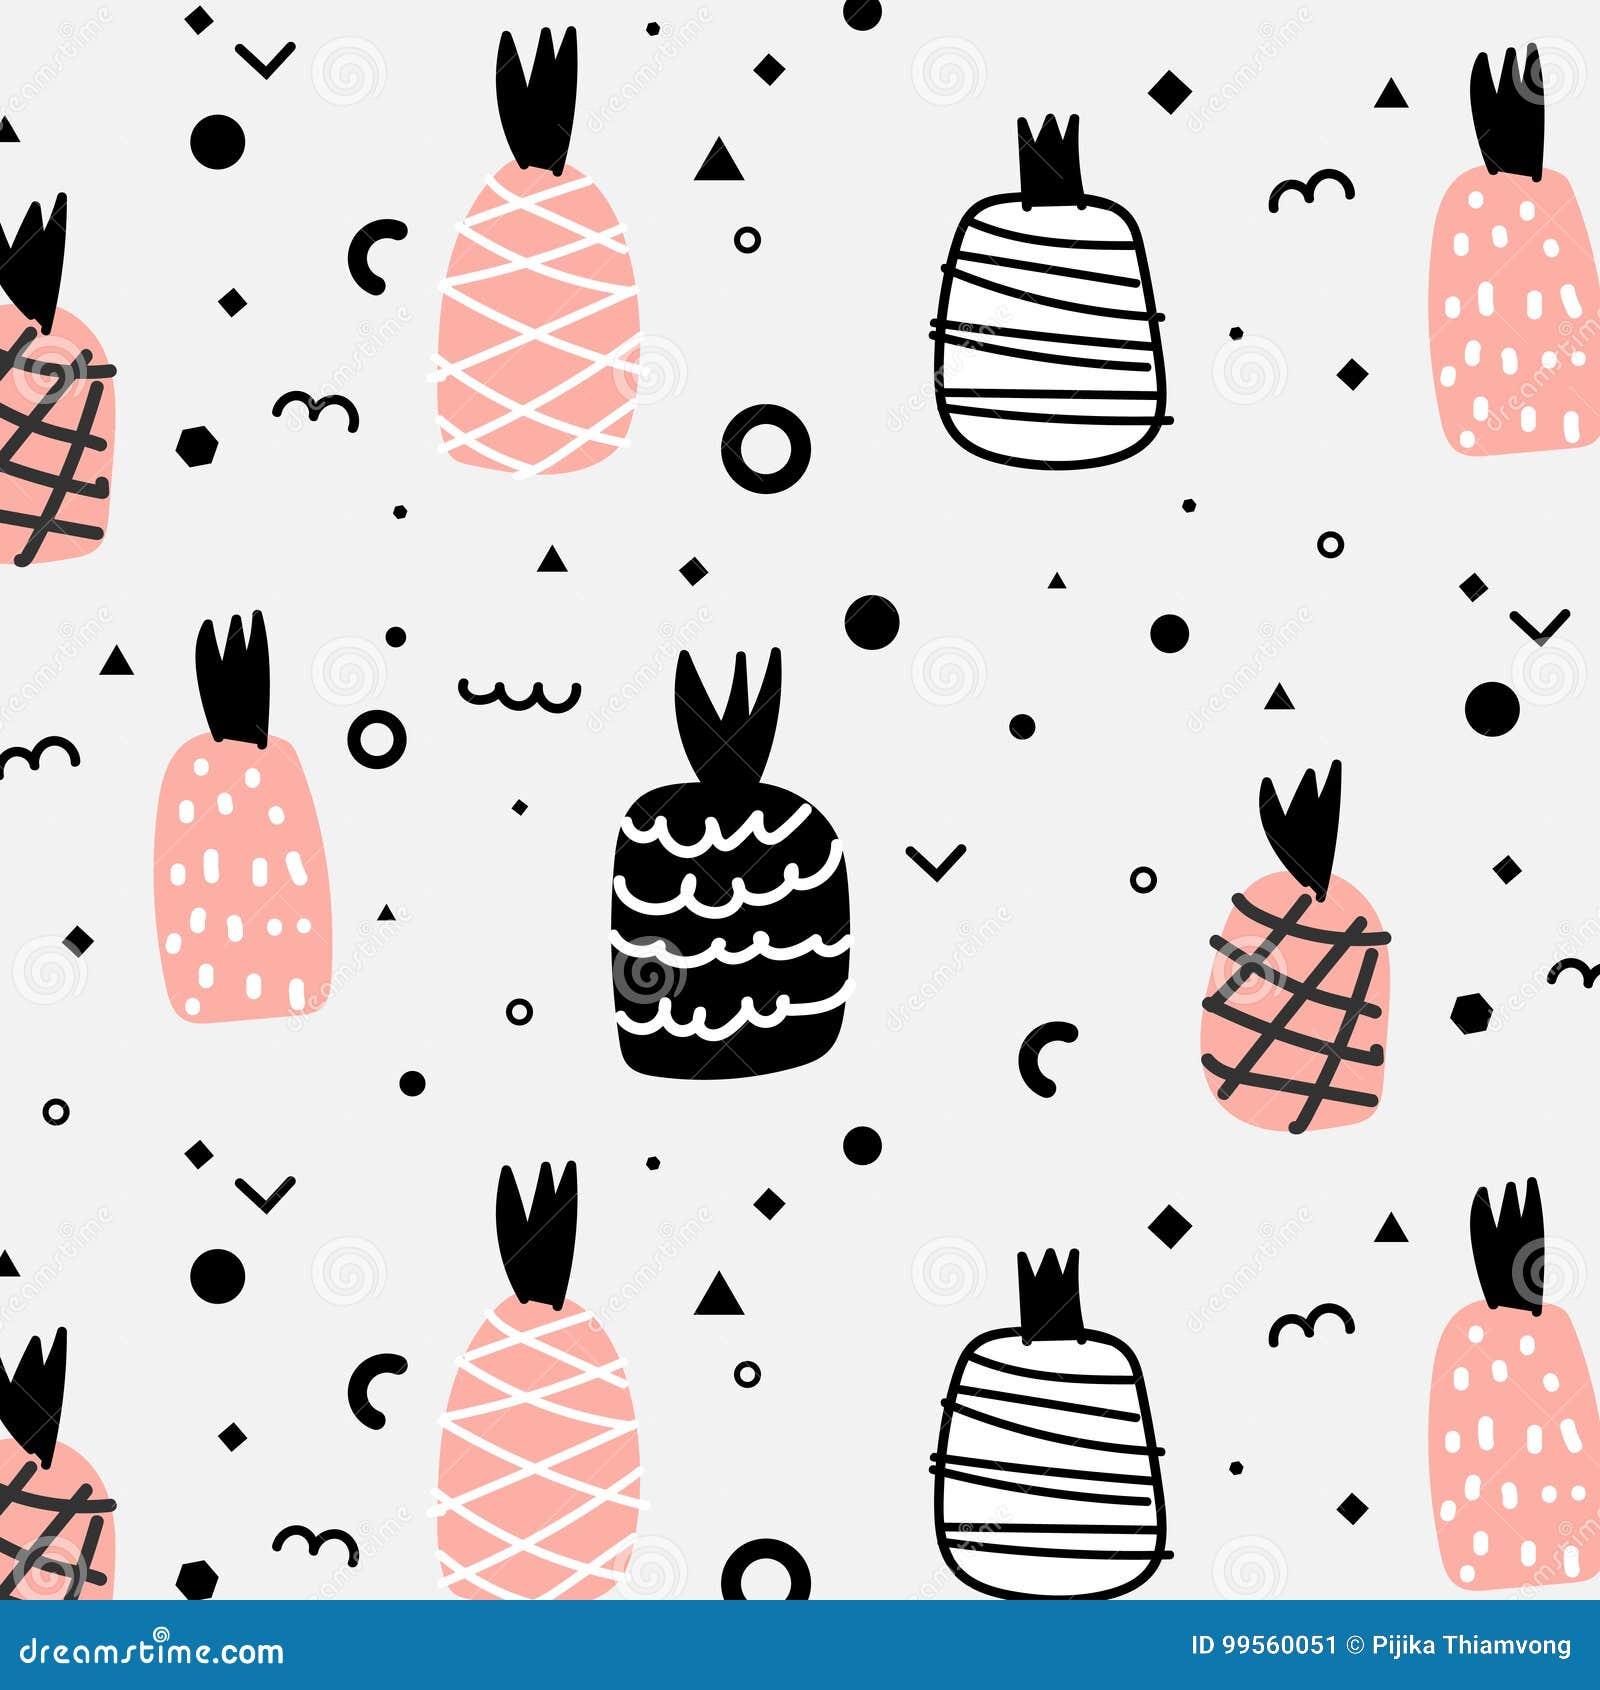 Geometric Flat And Cute Hand Drawn Pineapples Pattern.